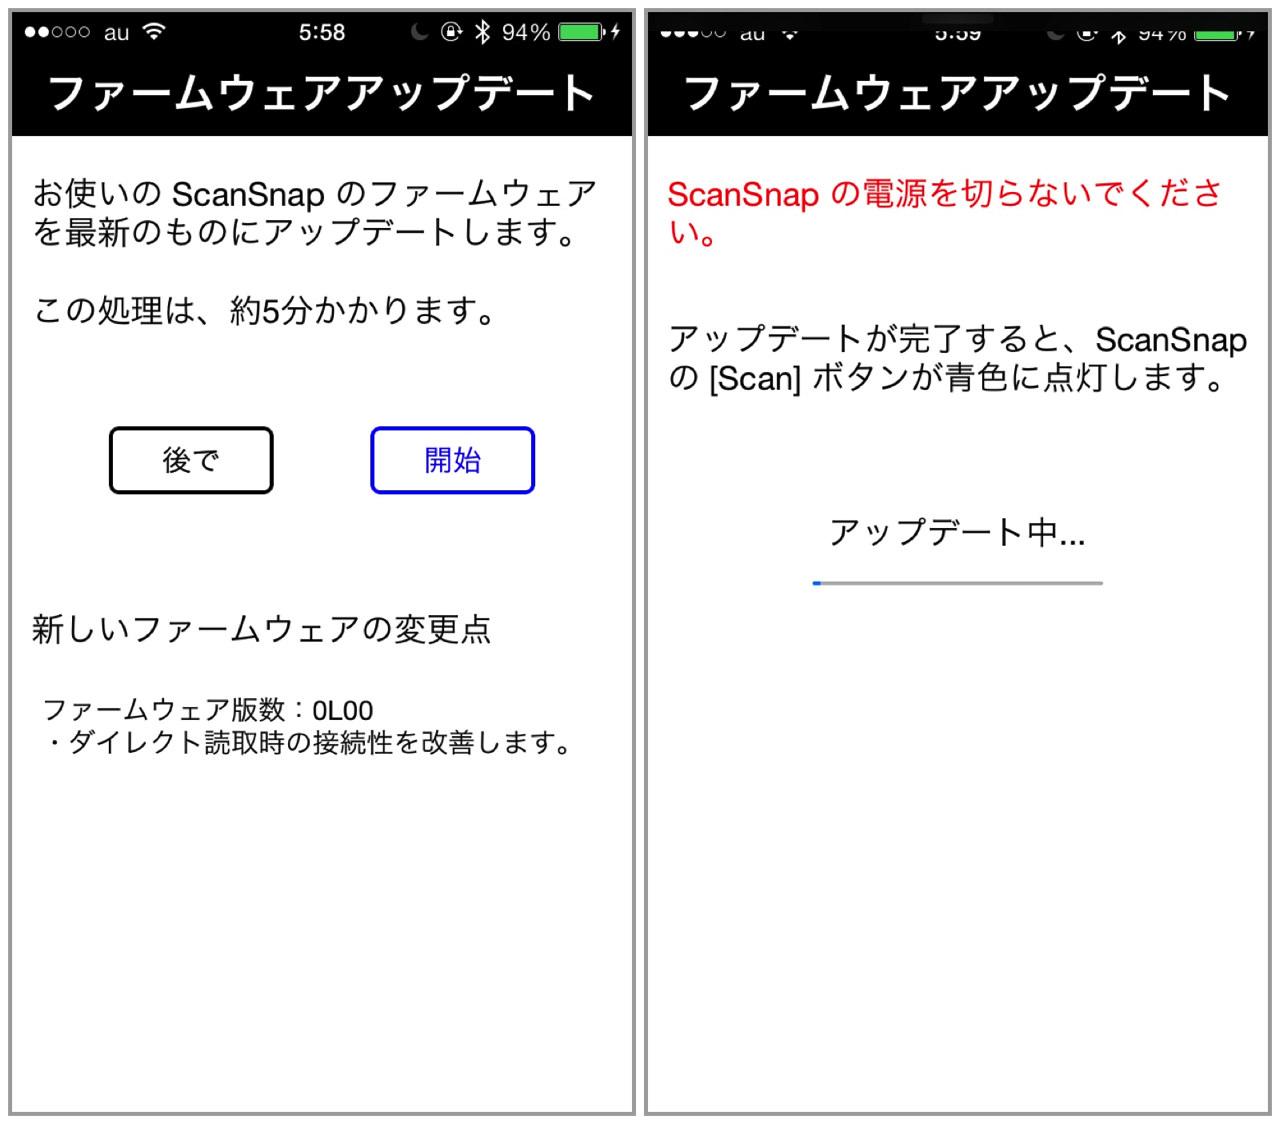 Fujitsu pfu scansnap ix100 snow white11